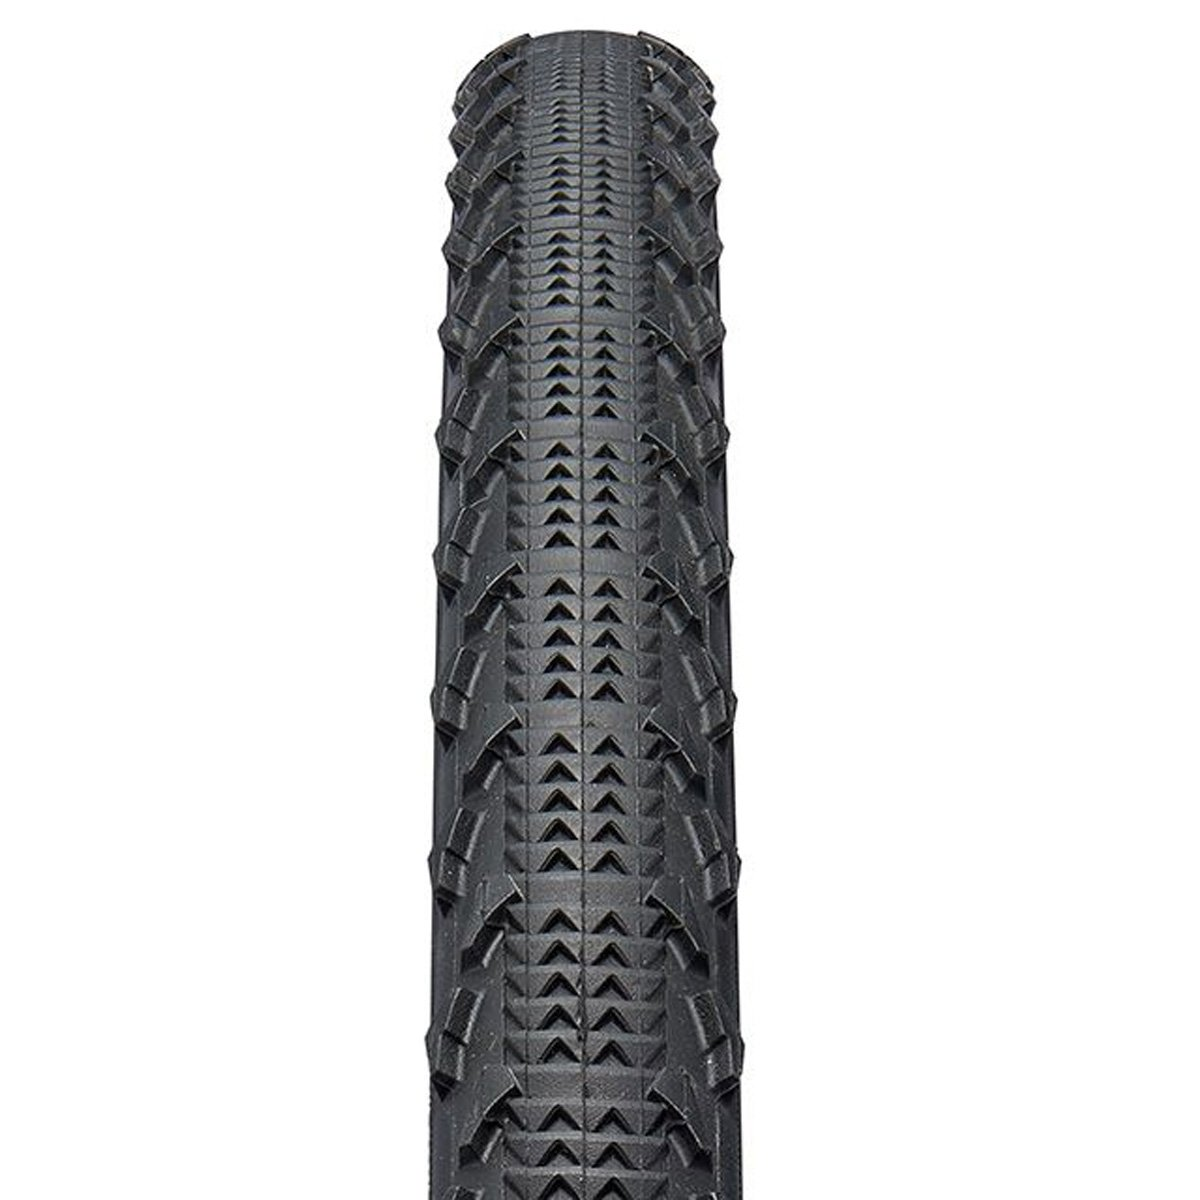 Ritchey WCS Speedmax Tubeless Readyシクロクロス折りたたみ自転車タイヤ B075VRM8NGブラック 700 x 40